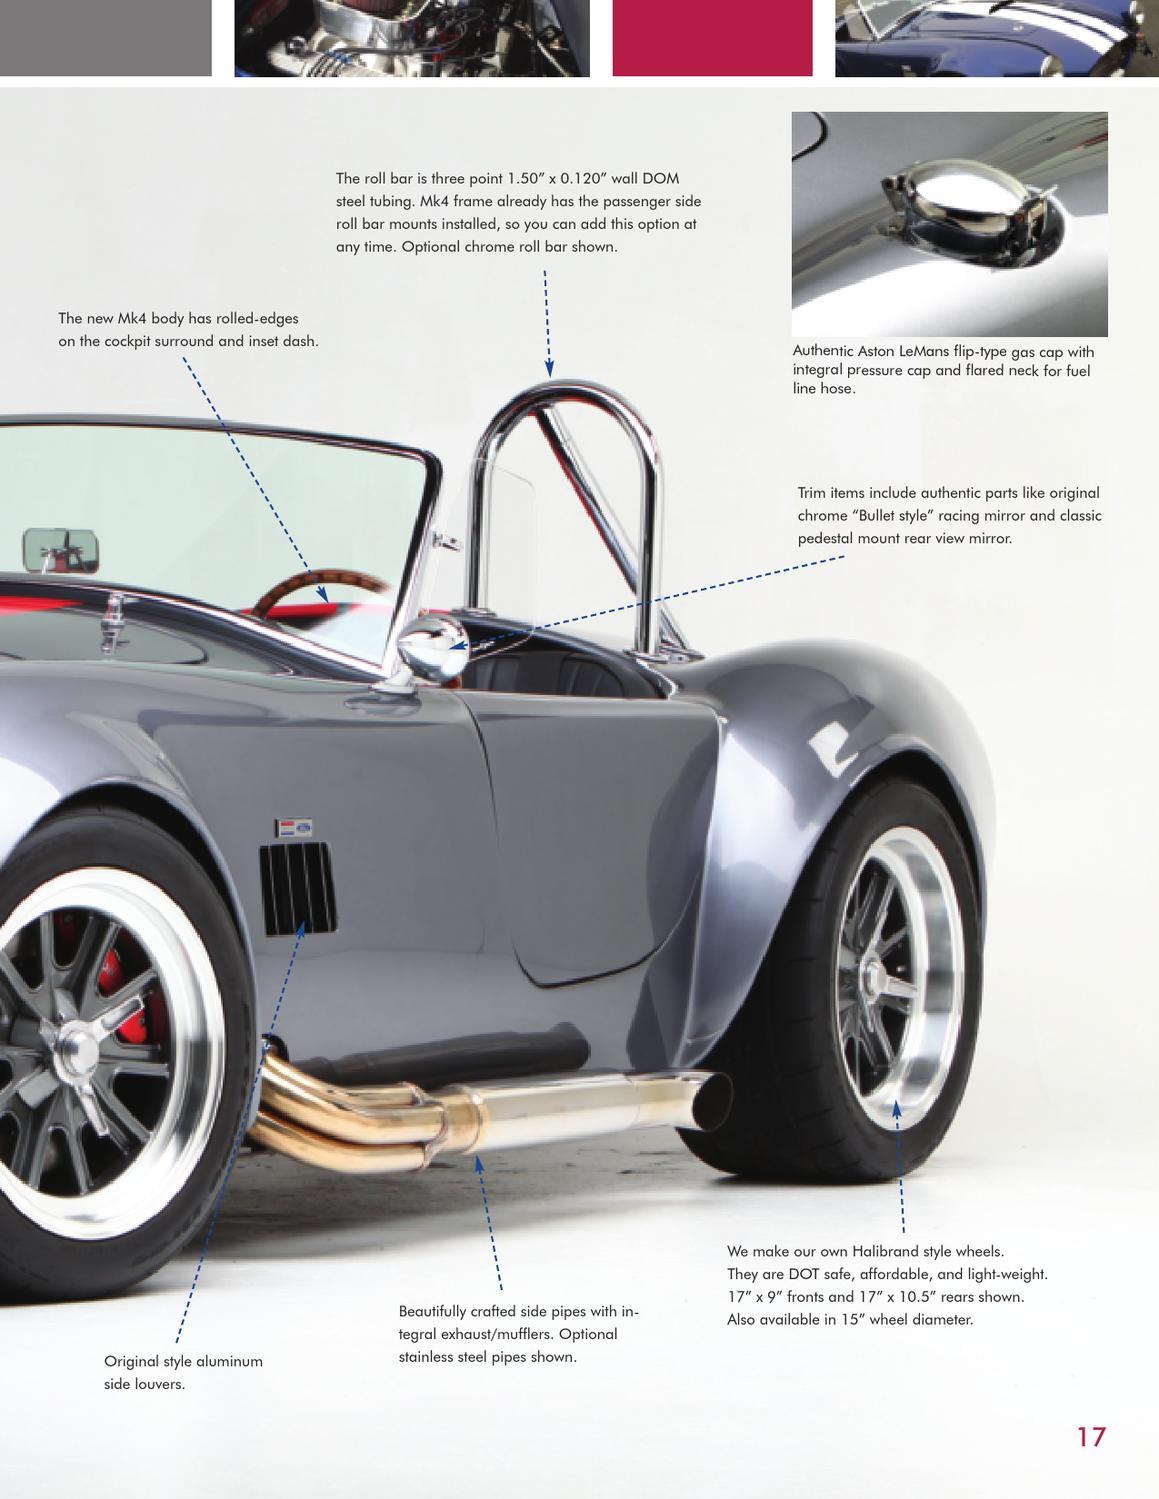 Factory Five Mk4 Roadster Brochure by David Lindsey - issuu